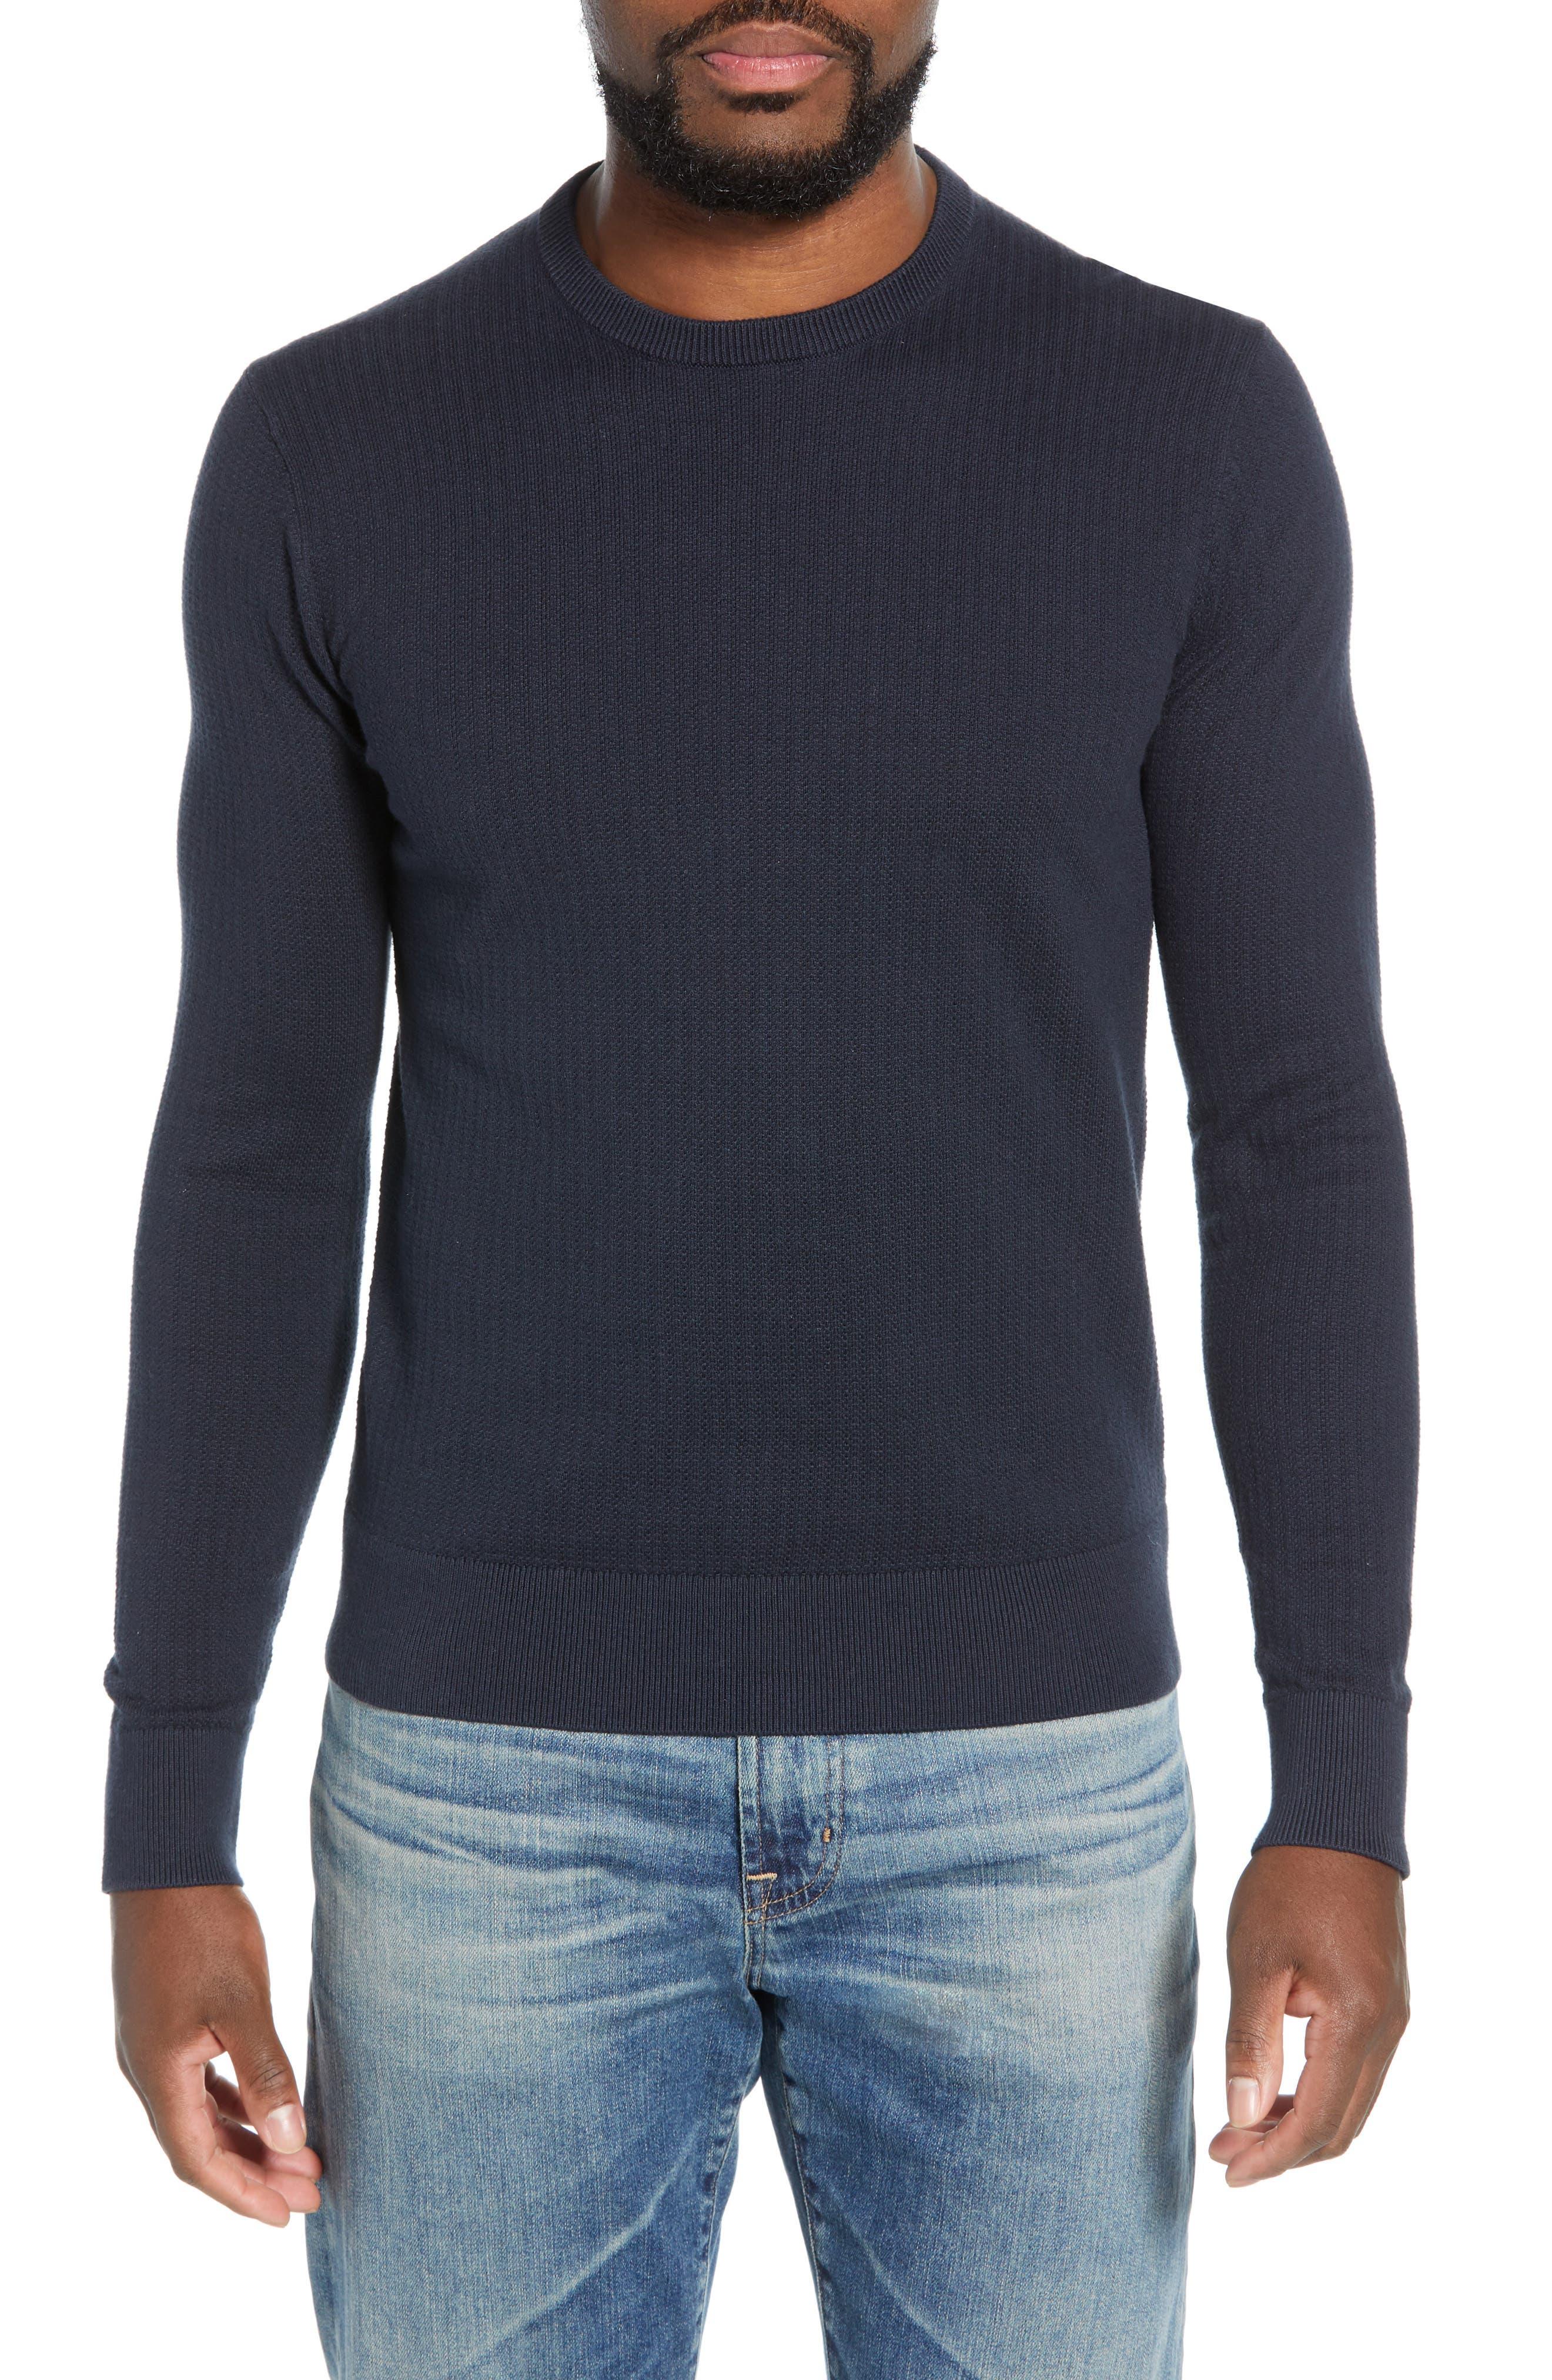 Todd Snyder Slim Fit Crewneck Sweater, Blue